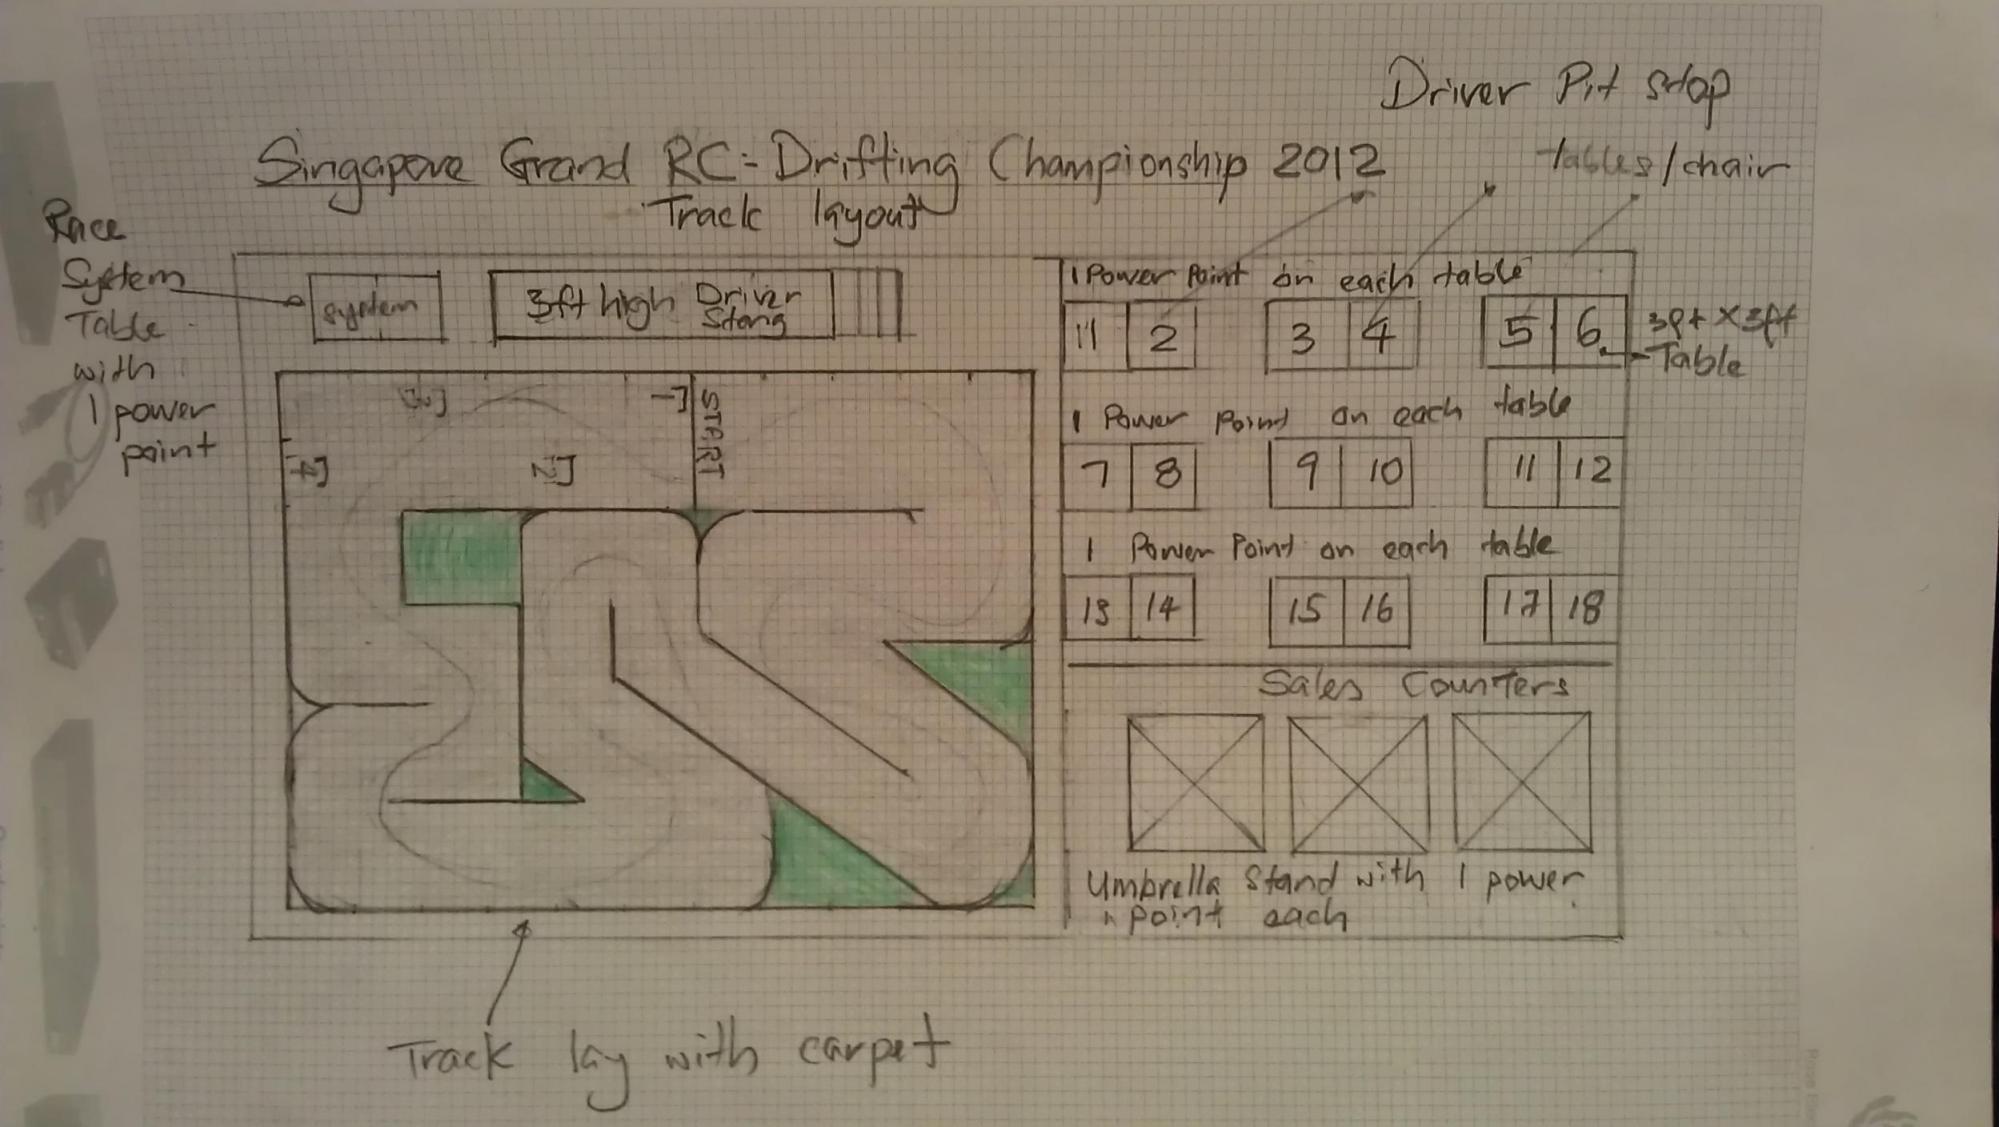 hight resolution of singapore grand rc drifting championship 2012 imag0719 jpg